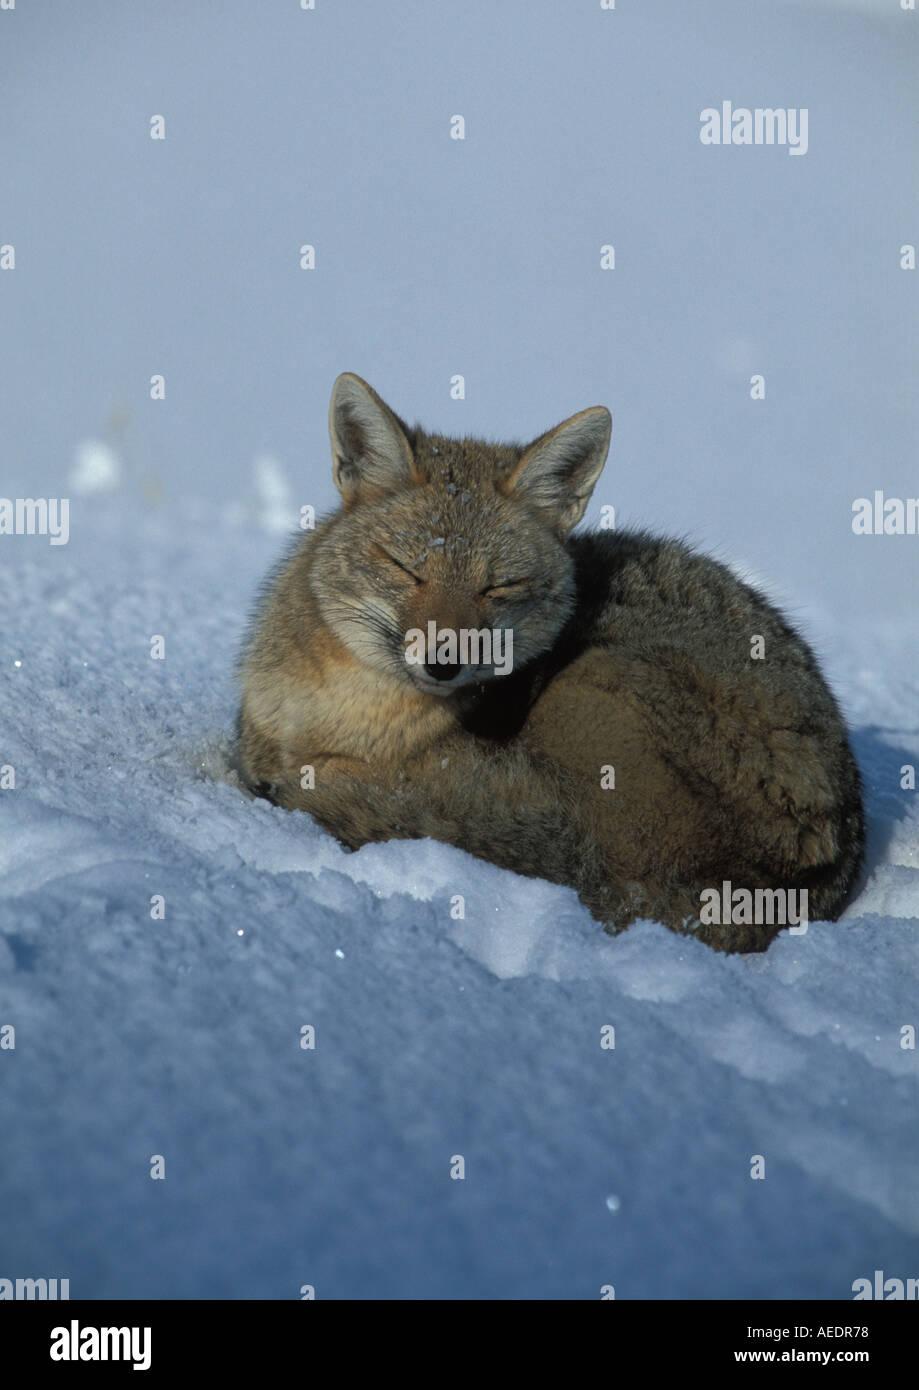 Grauer Fuchs Portrat Winter Stockfoto Bild 4457335 Alamy